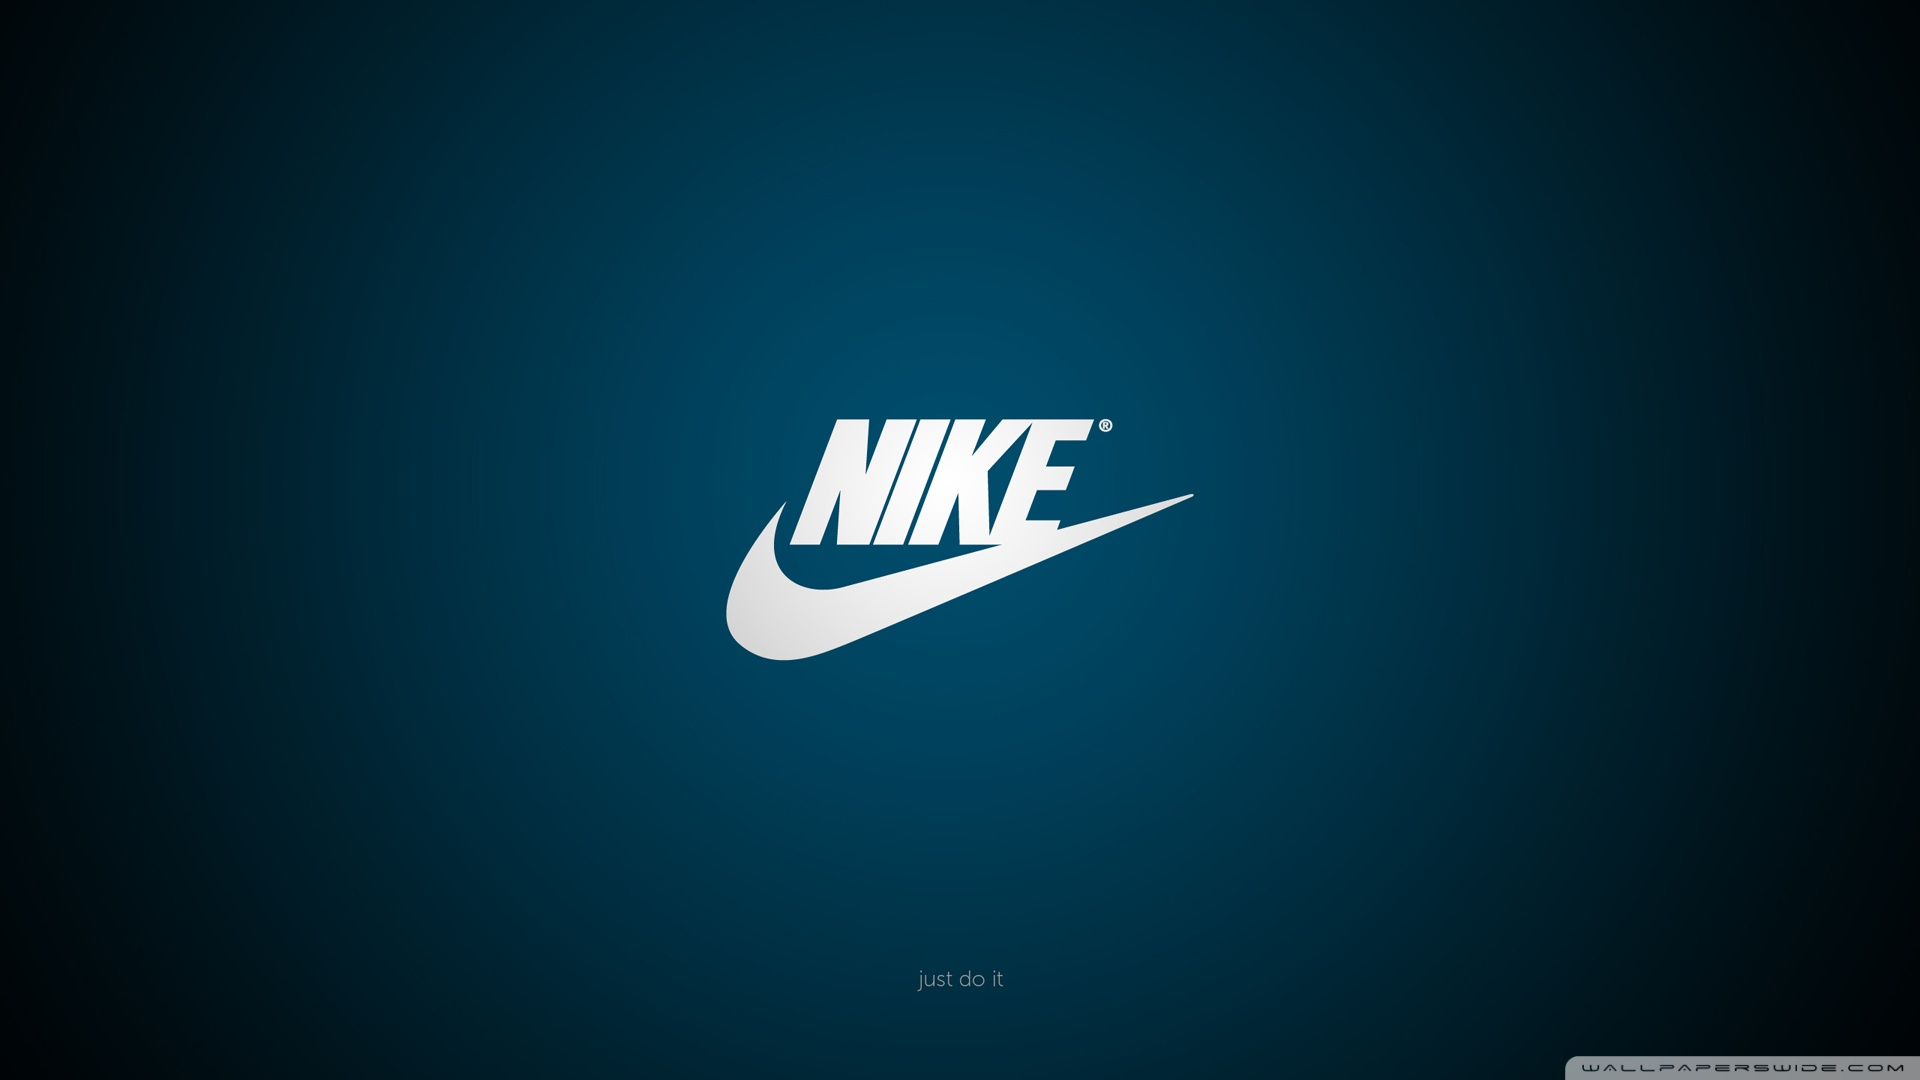 General 1920x1080 Nike logo blue blue background